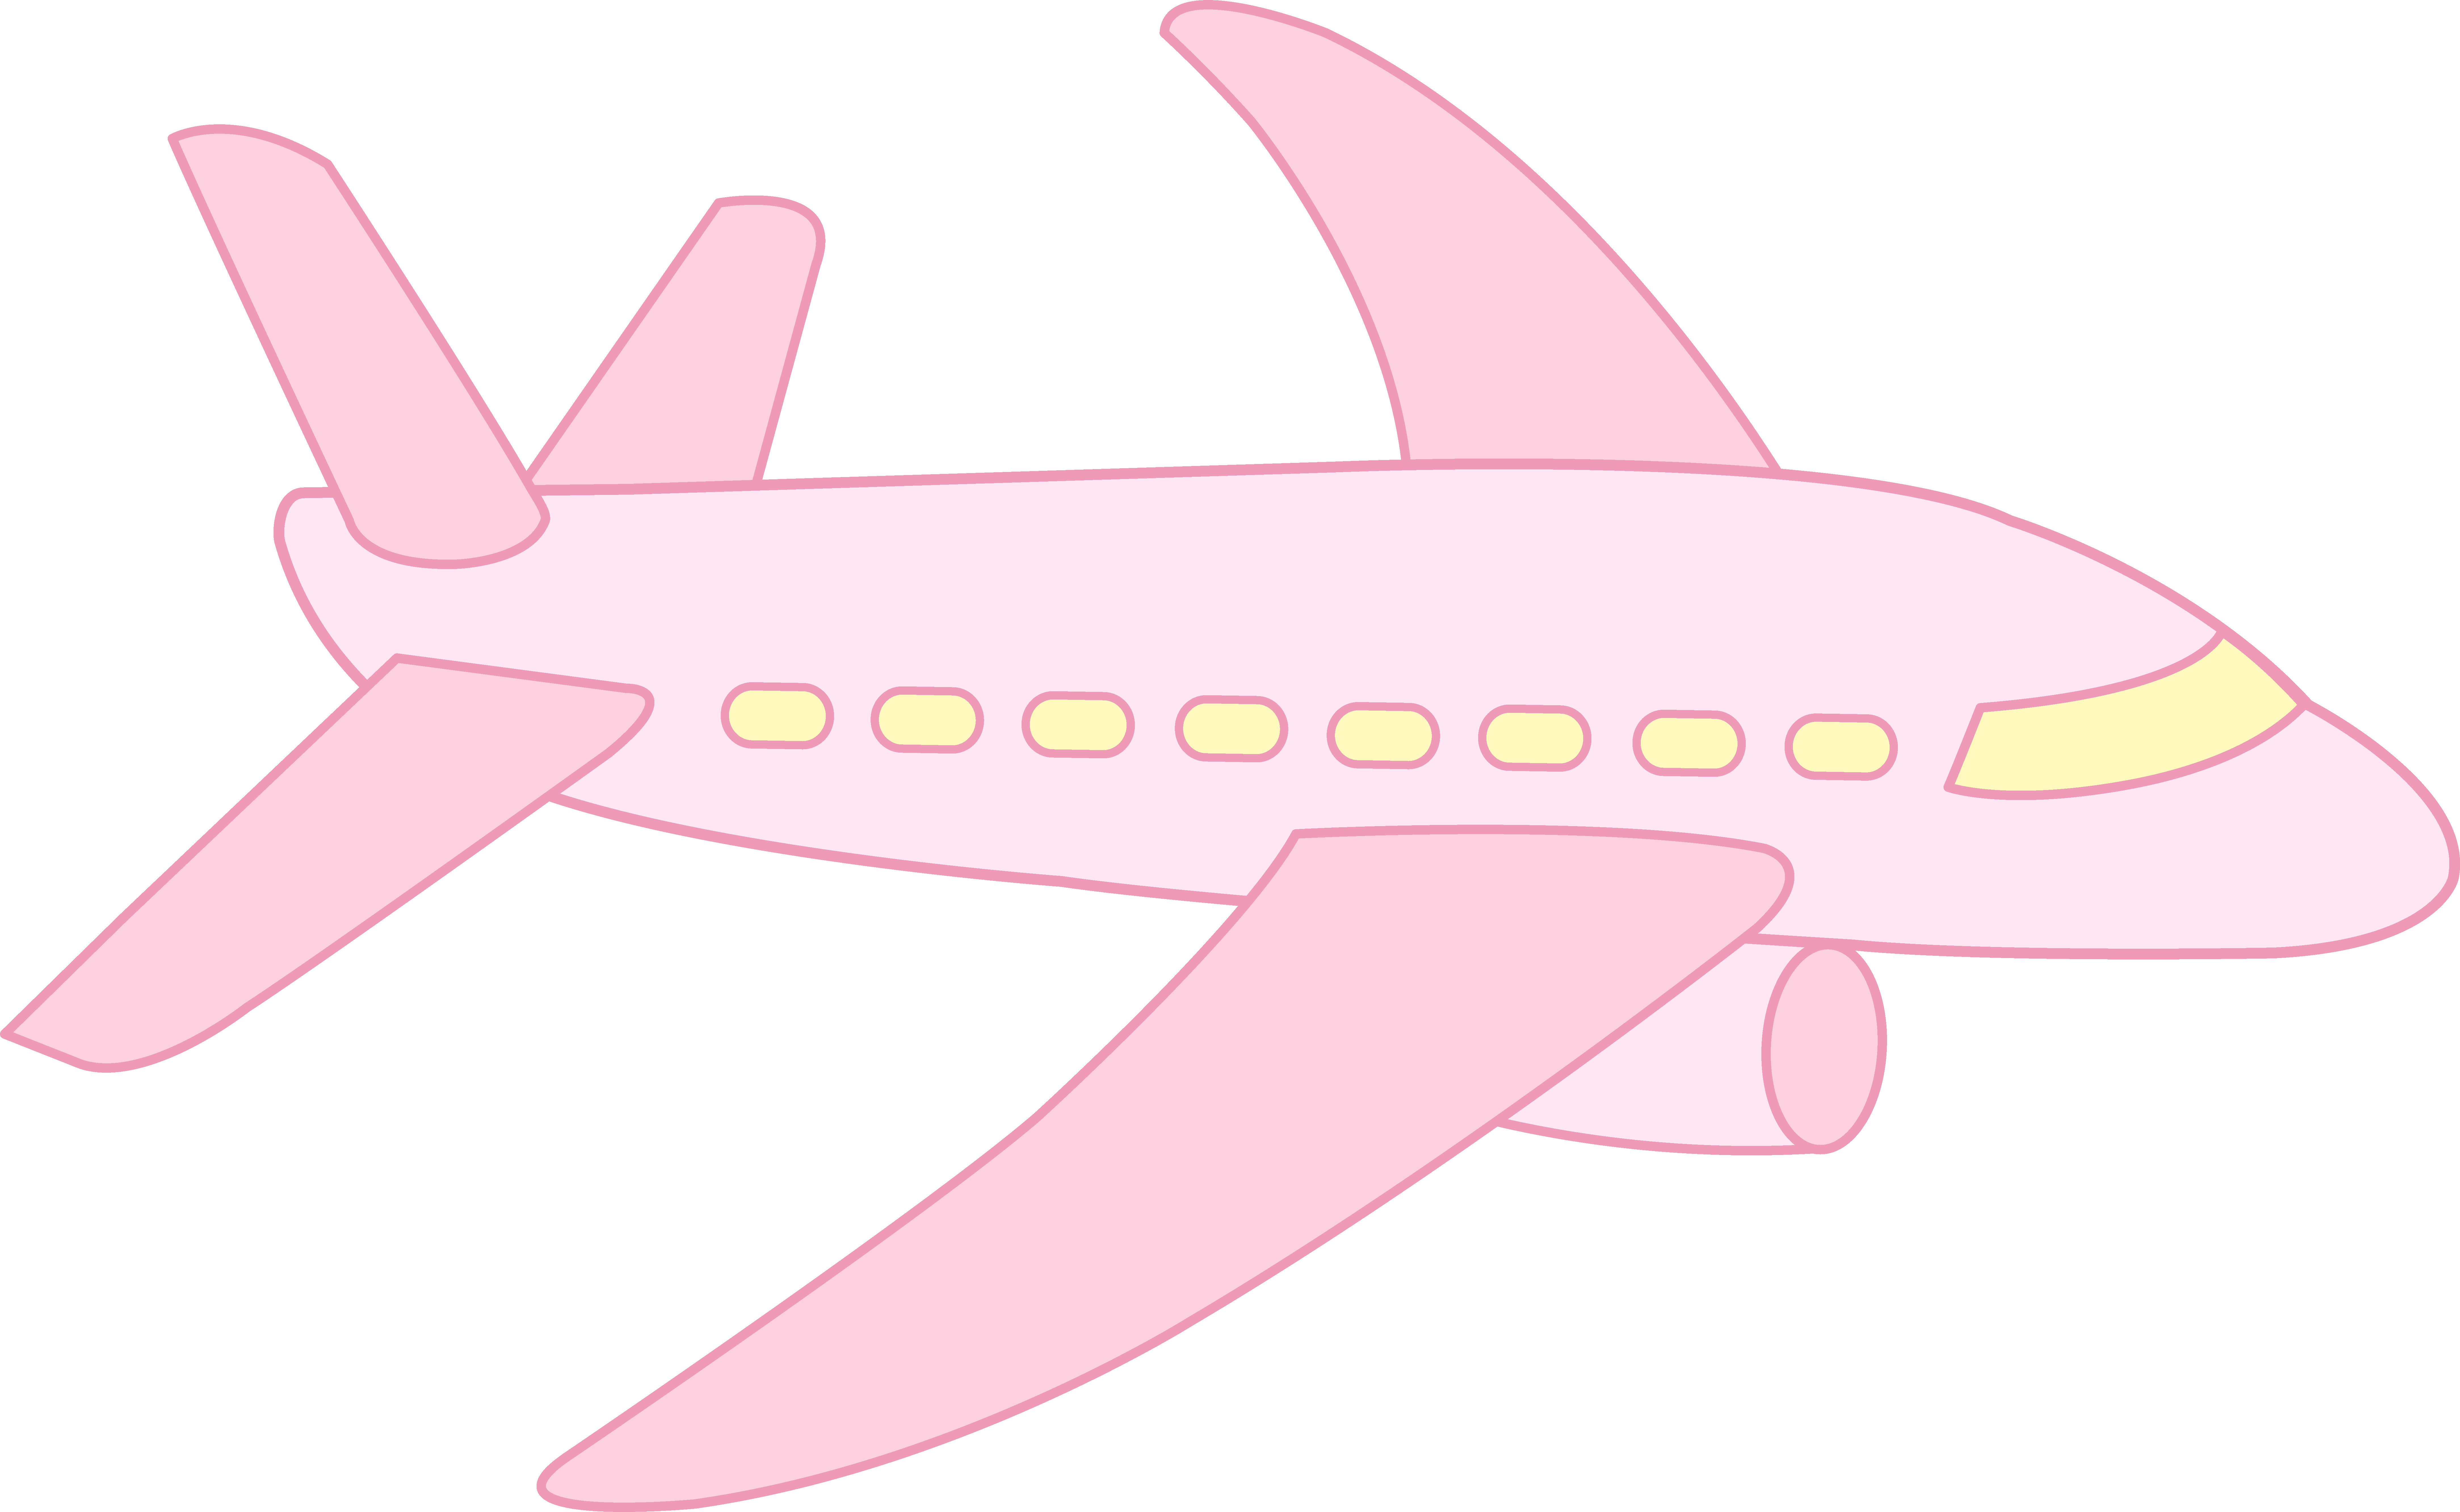 cute airplane cute pink airplane free clip art [ 8669 x 5328 Pixel ]